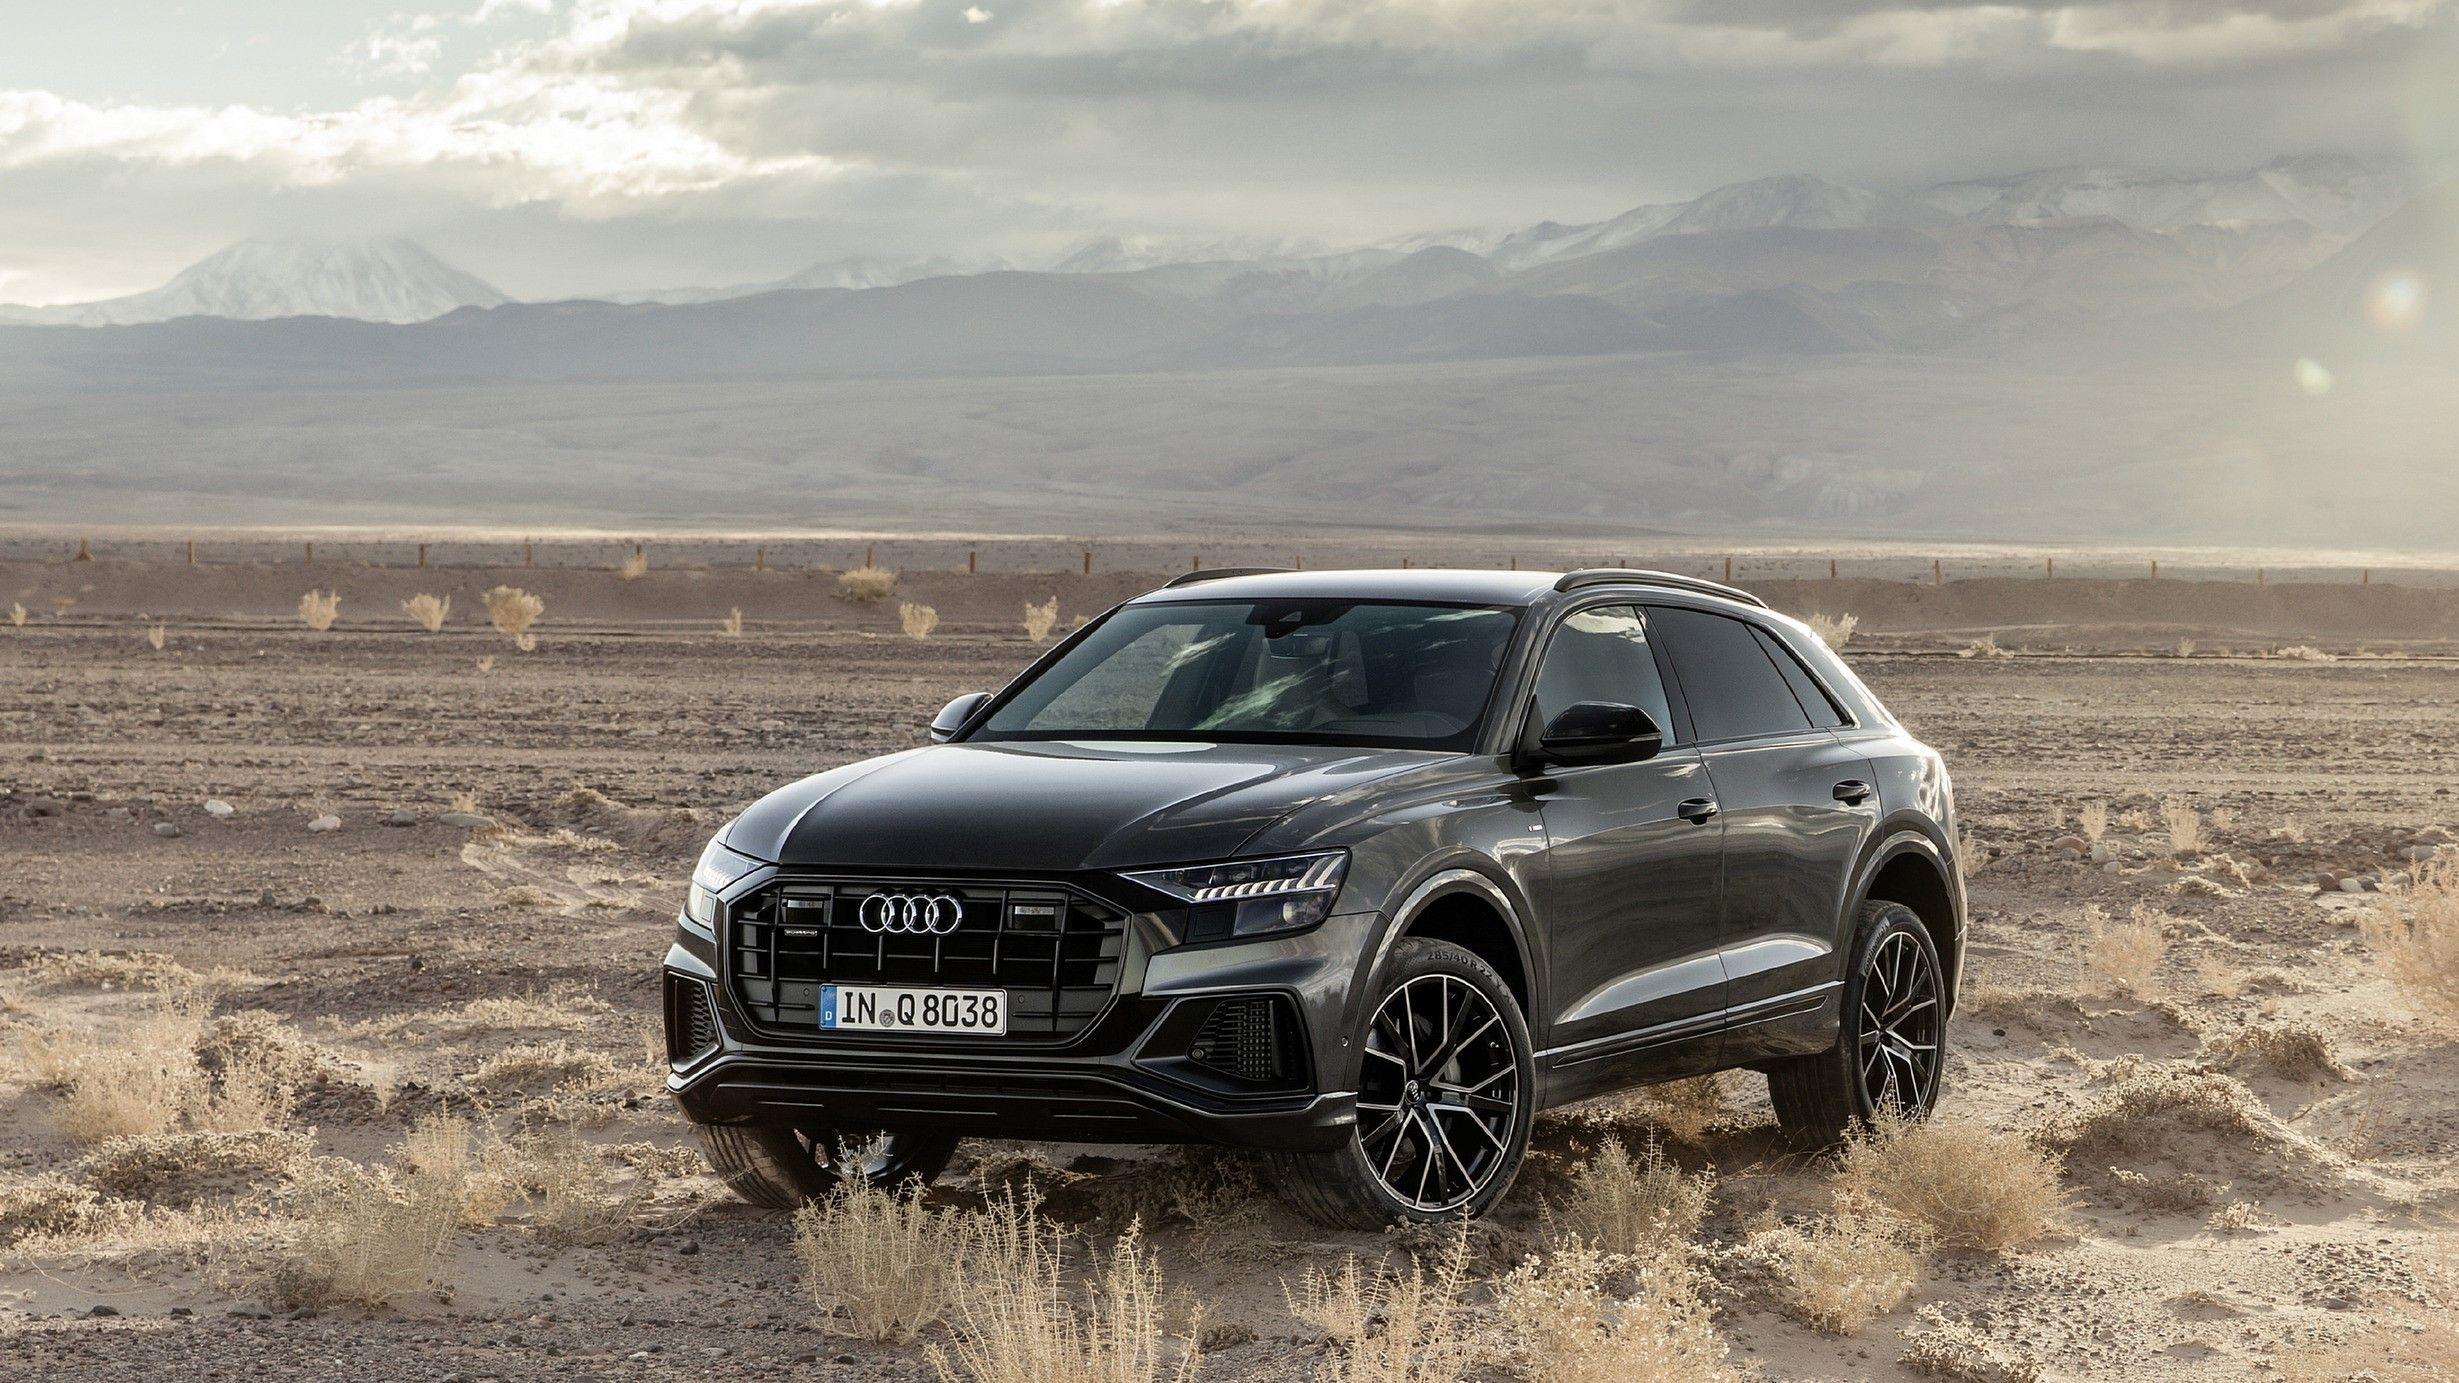 2021 Audi Q8 Review Trims Pricing Performance Features And Rivals Comparison Audi Audi Suv Audi Q8 Price